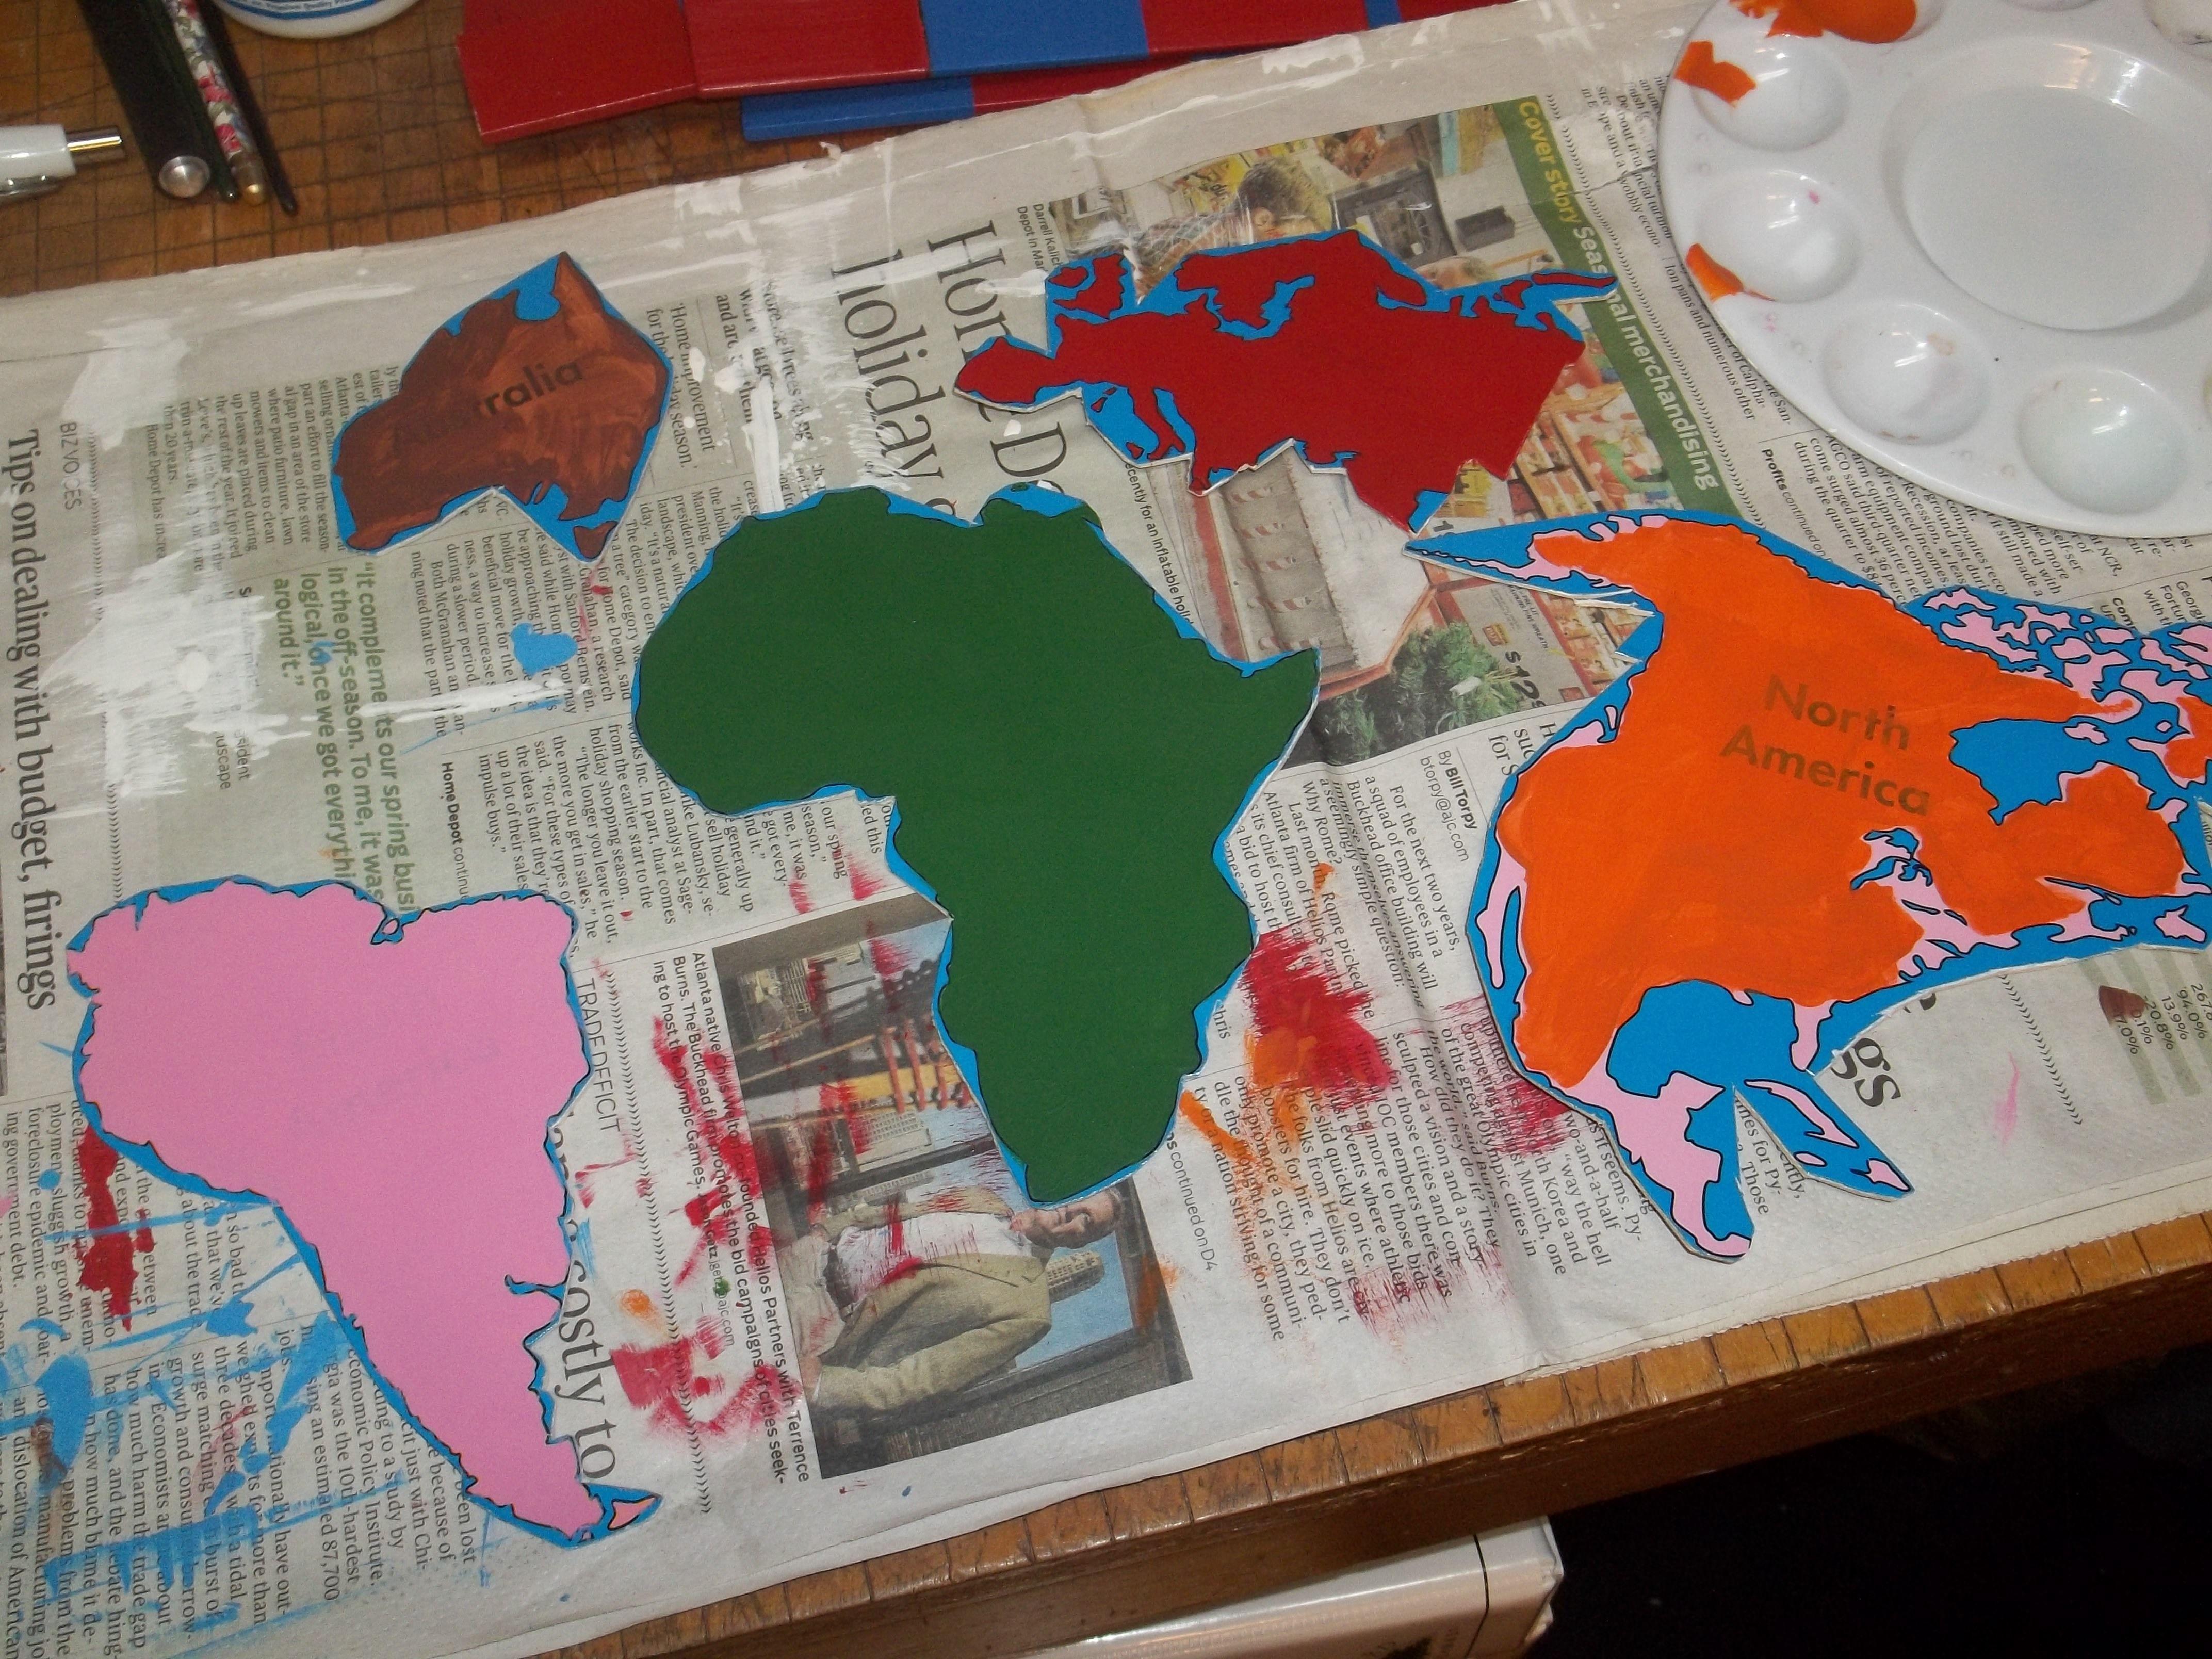 Diy montessori world continents map puzzle work in progress diy montessori world continents map puzzle work in progress gumiabroncs Gallery